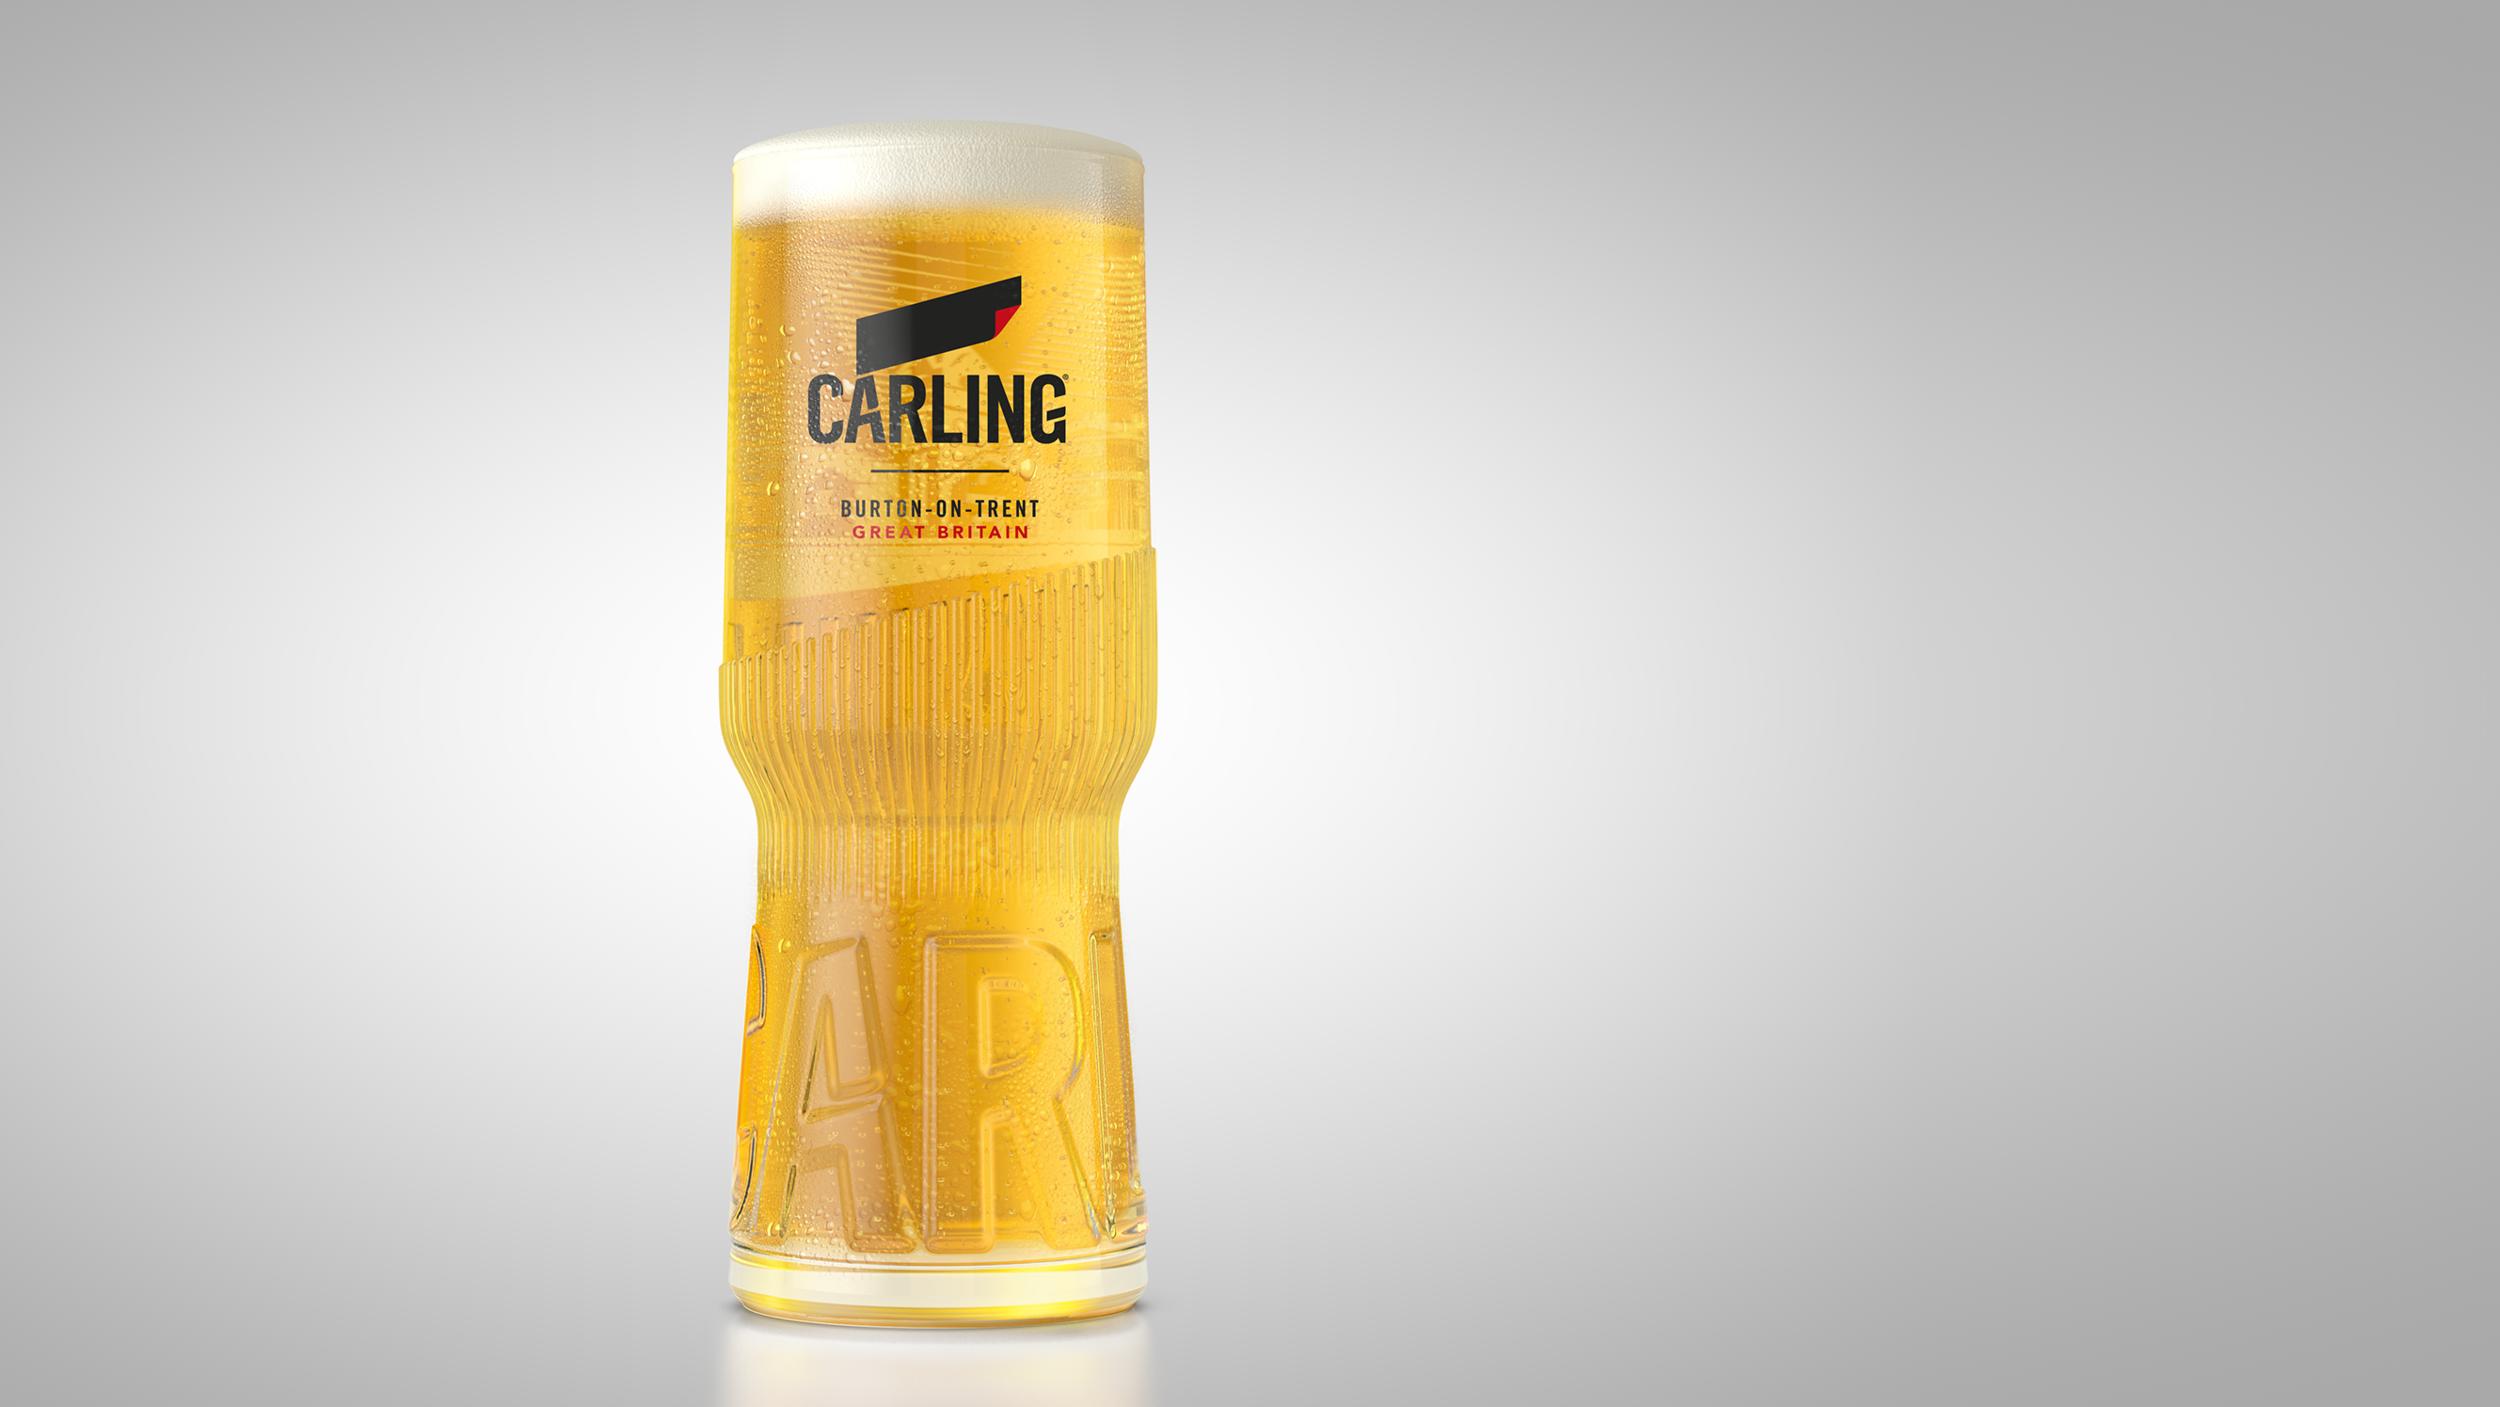 BrandOpus - Carling Glass4.png